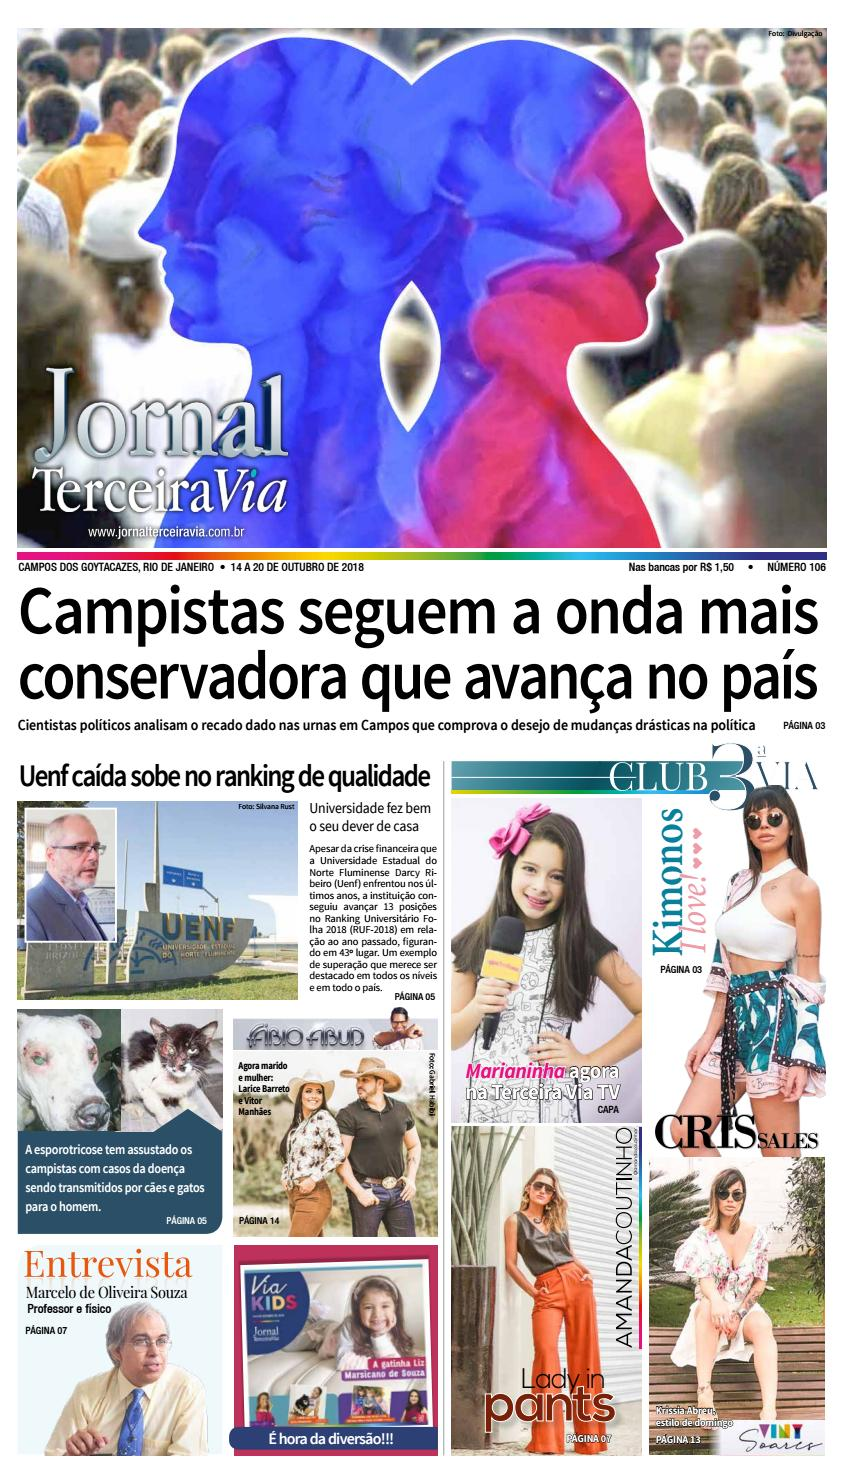 Jornal Terceira Via ed106 by terceiravia - issuu 3940682580